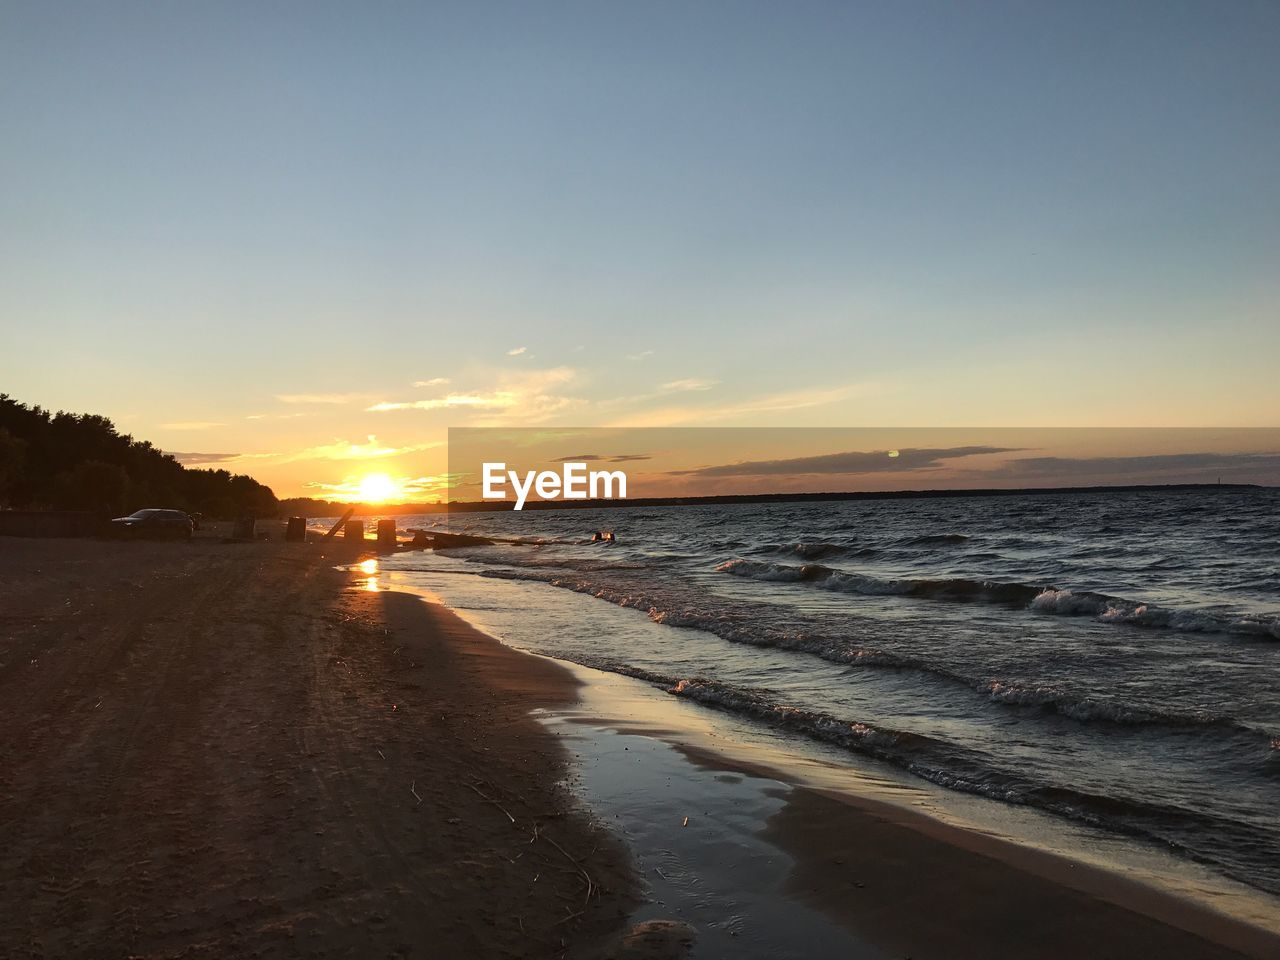 sunset, water, sky, scenics - nature, sea, beach, land, beauty in nature, tranquility, tranquil scene, nature, orange color, no people, idyllic, cloud - sky, sun, outdoors, non-urban scene, horizon